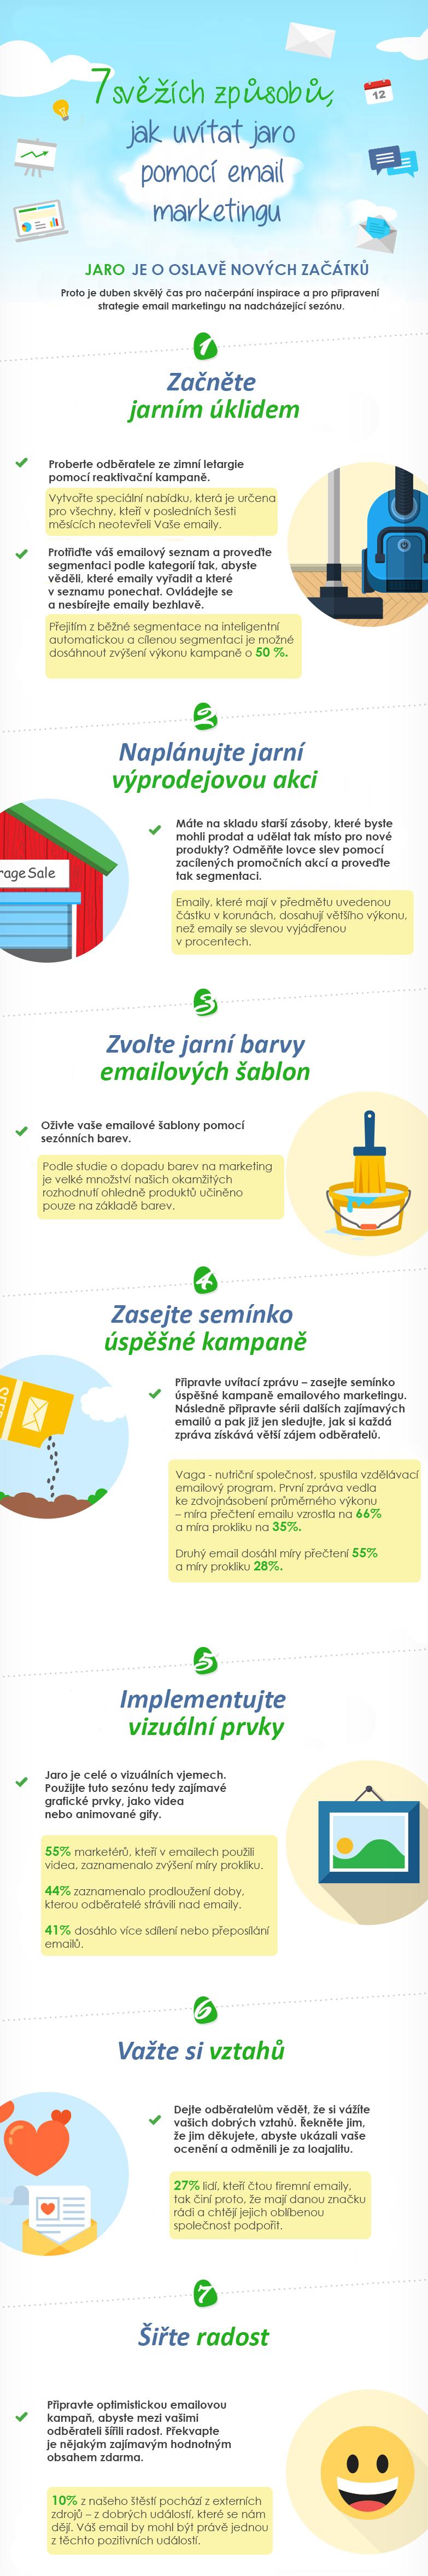 infografika_7_svezich_zpusobu_jak_uvitat_jaro_pomoci_emailoveho_marketingu2